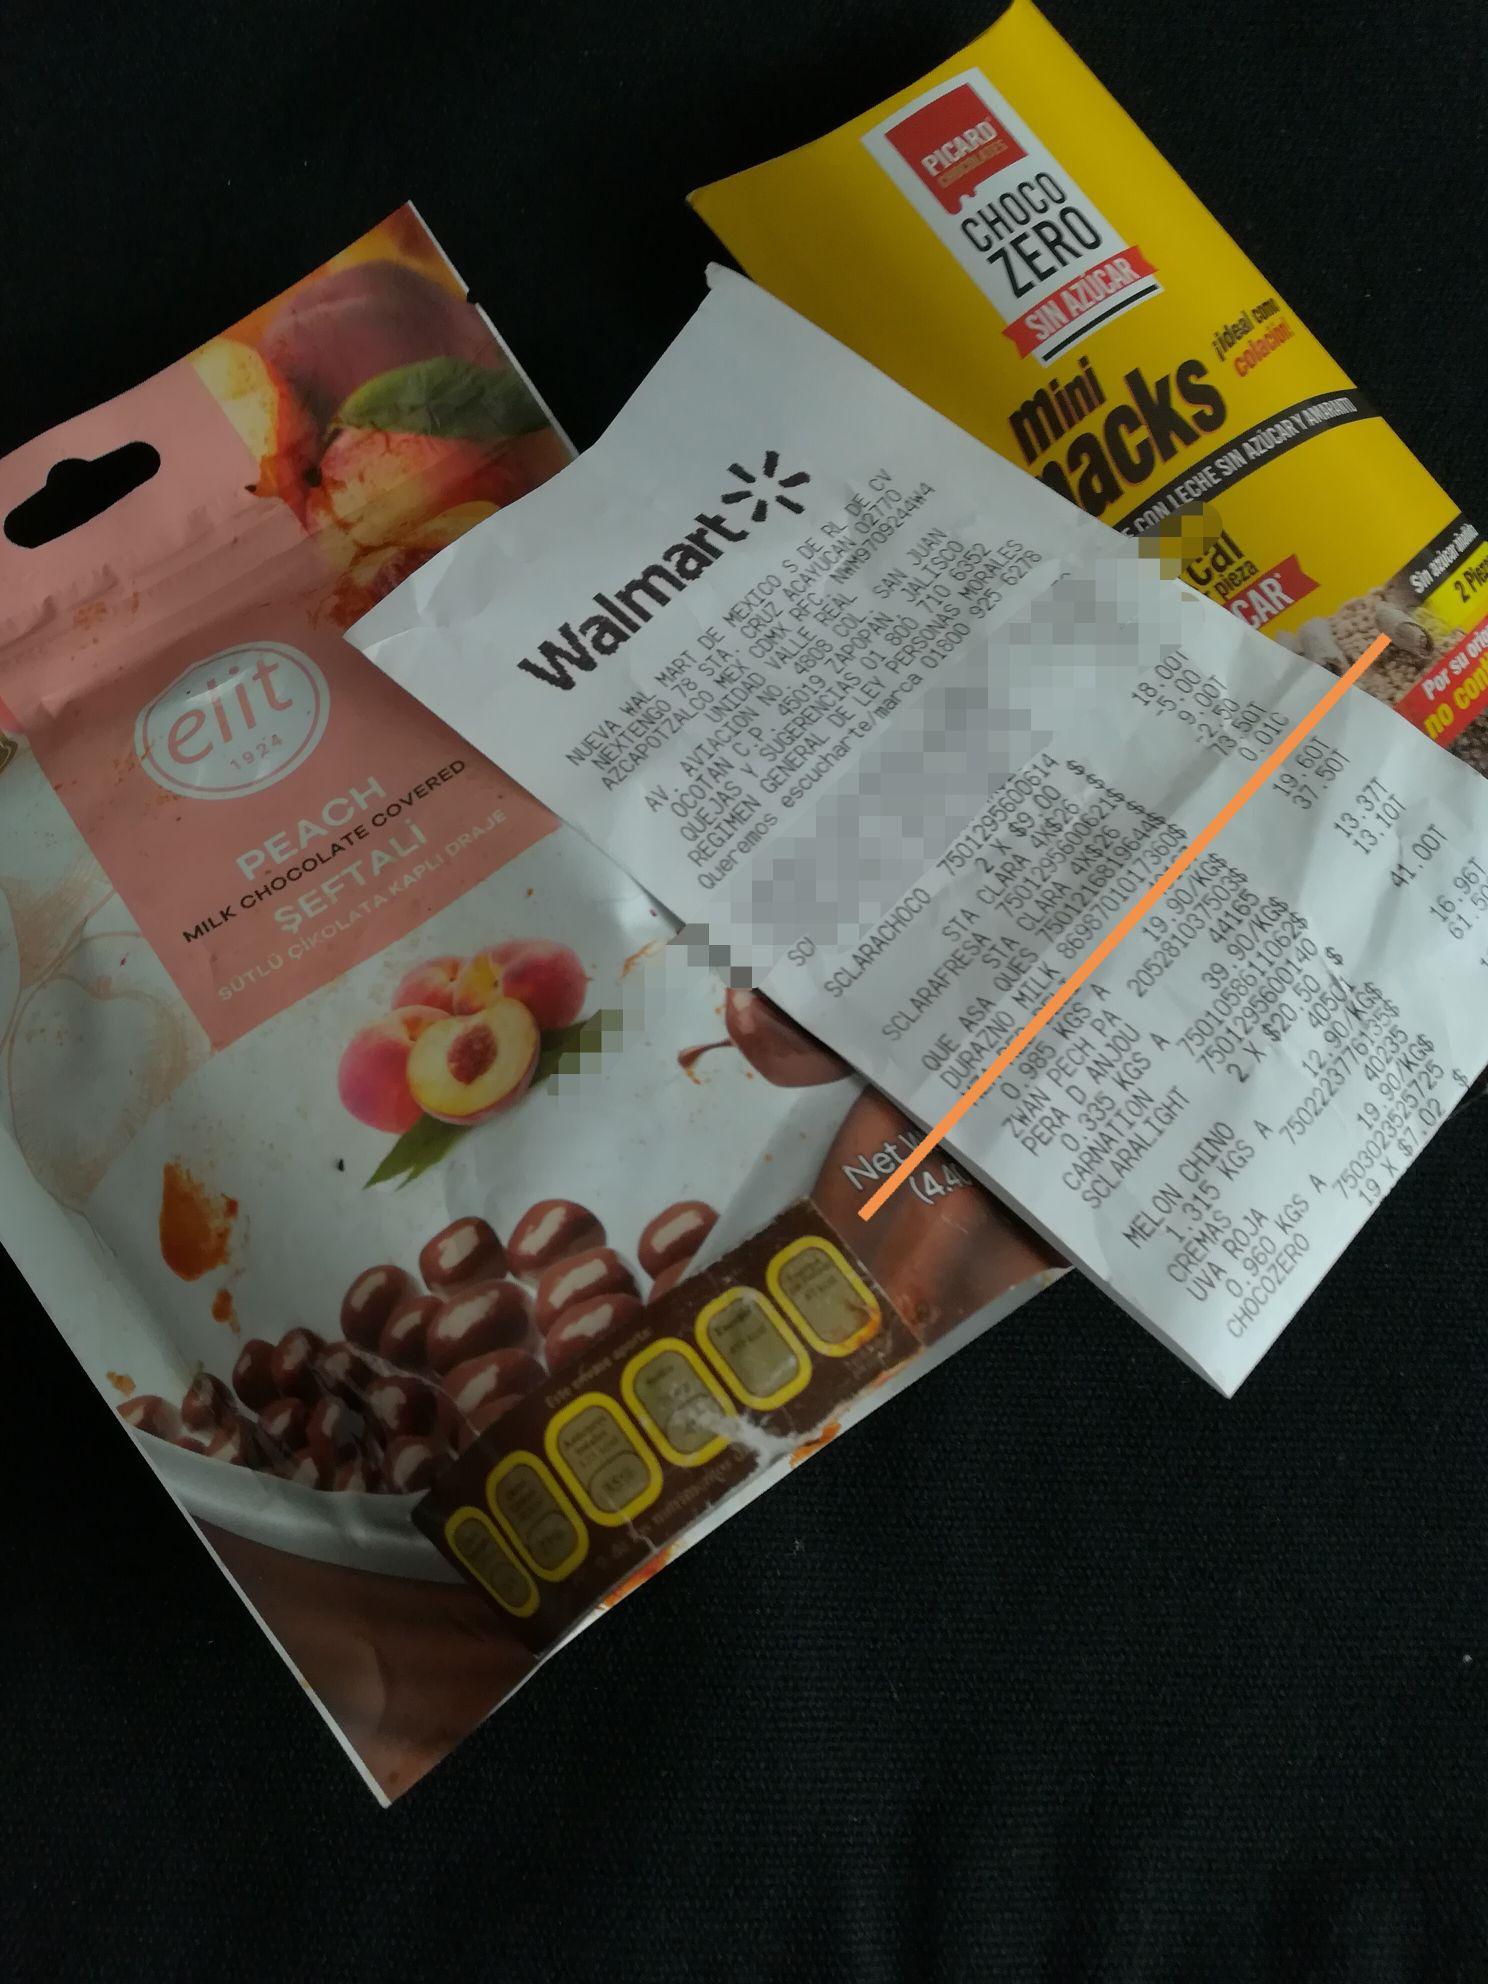 Walmart : Chocolate Elite $0.01, Chocozero$7.02